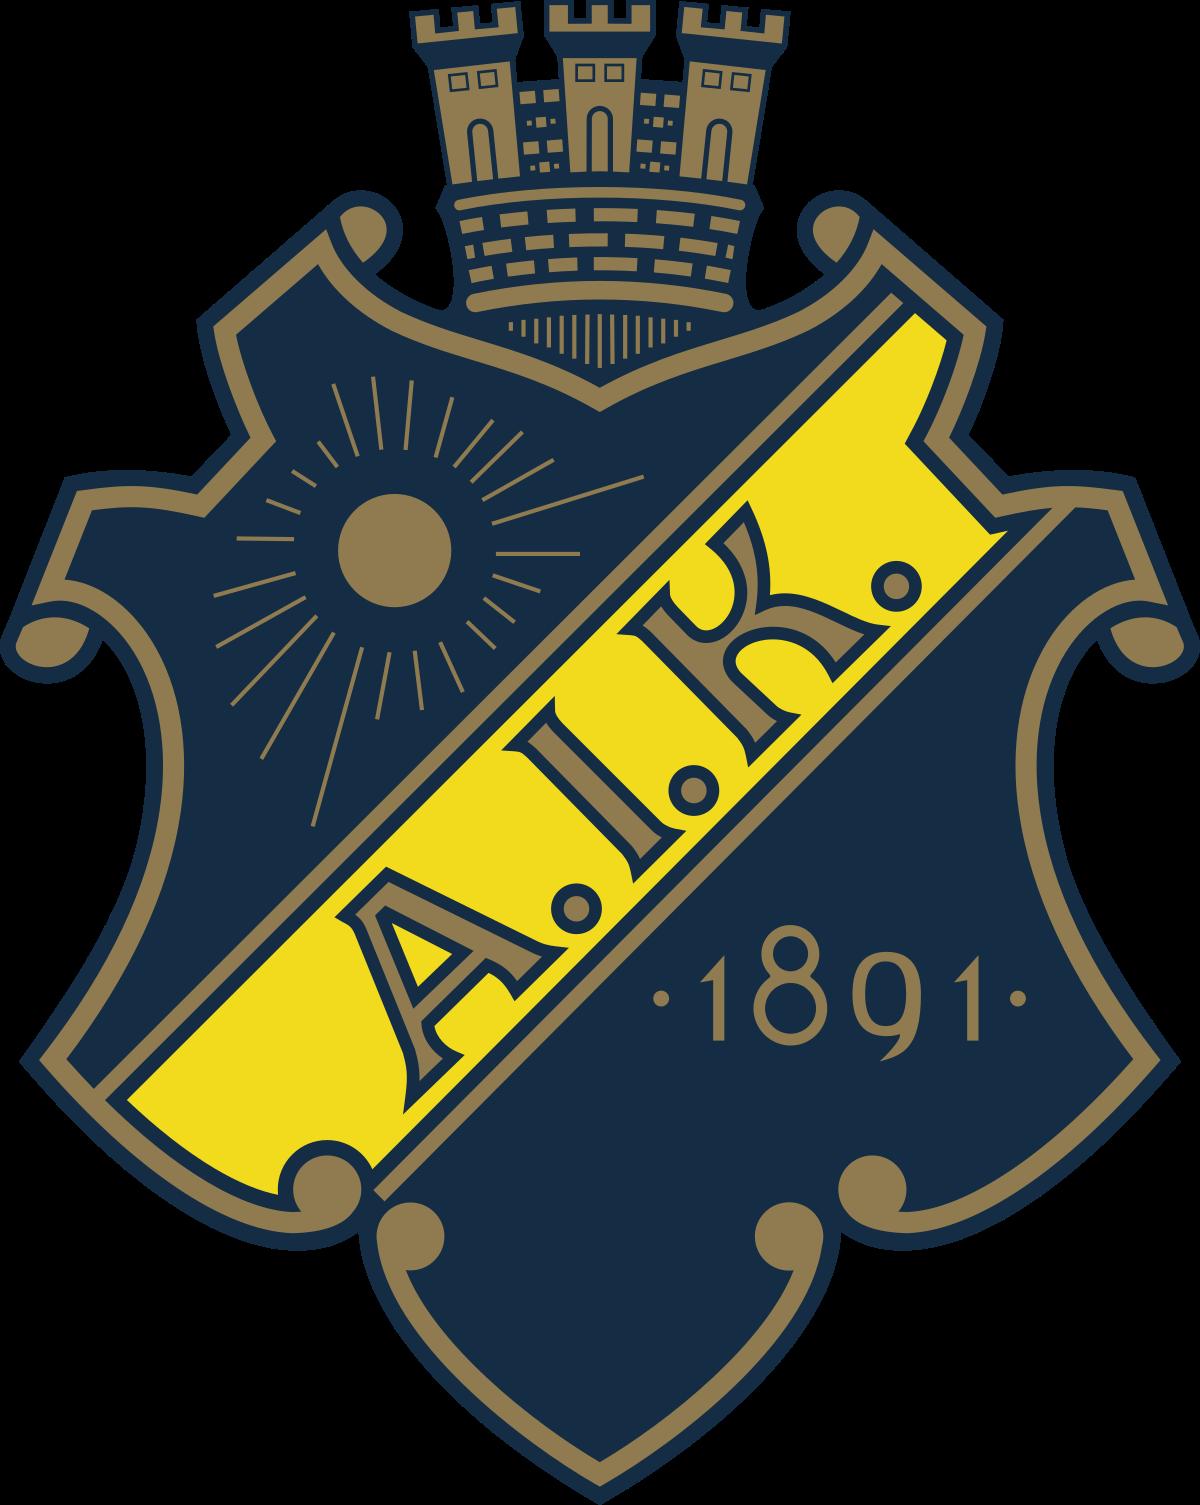 Programme TV AIK Stockholm